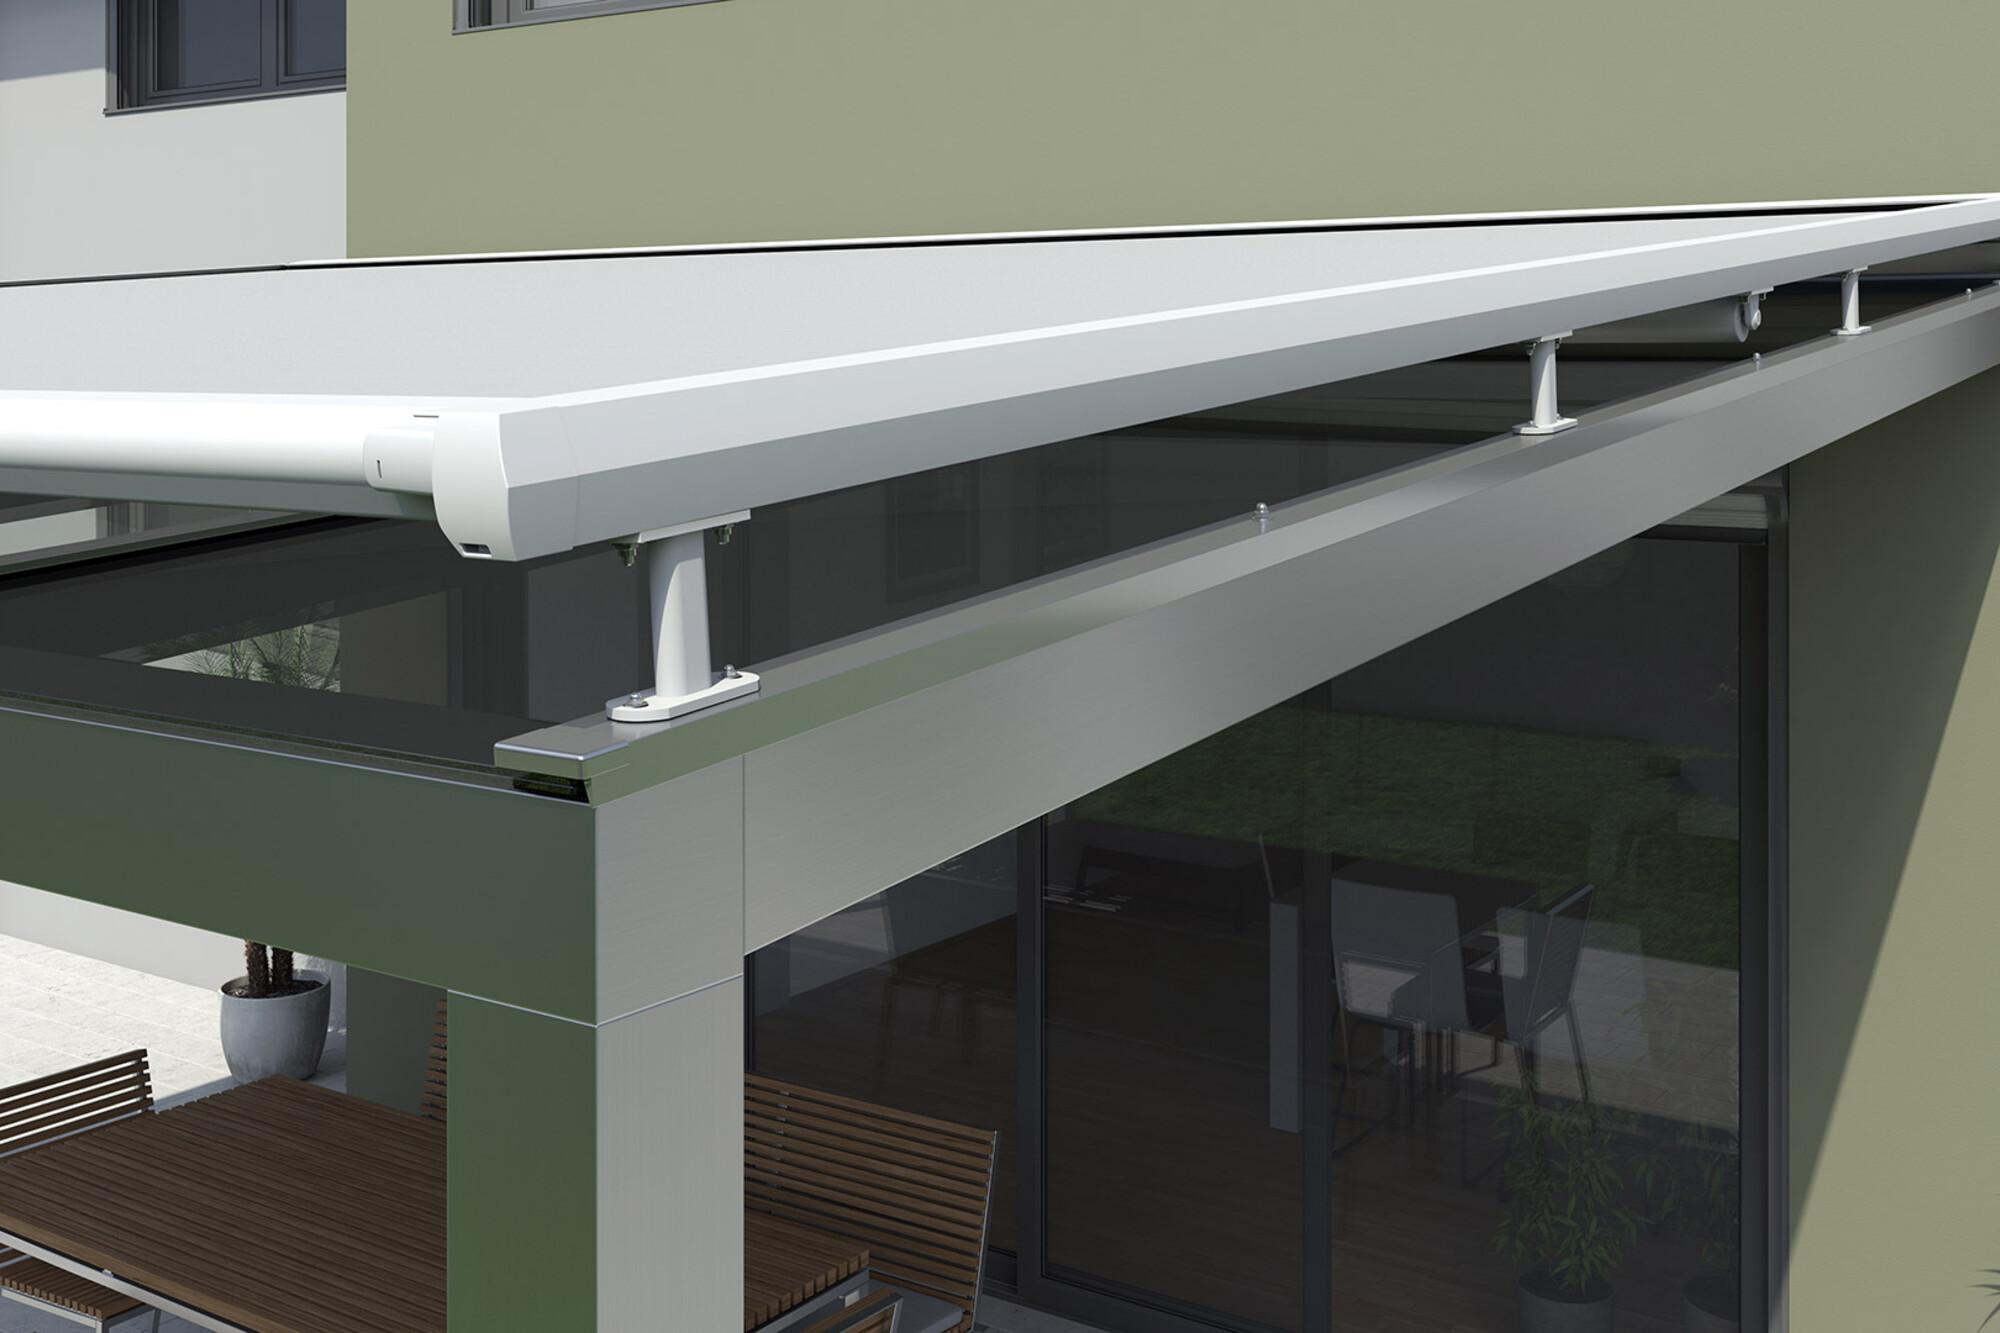 Product: Conservatory awning – XLINE